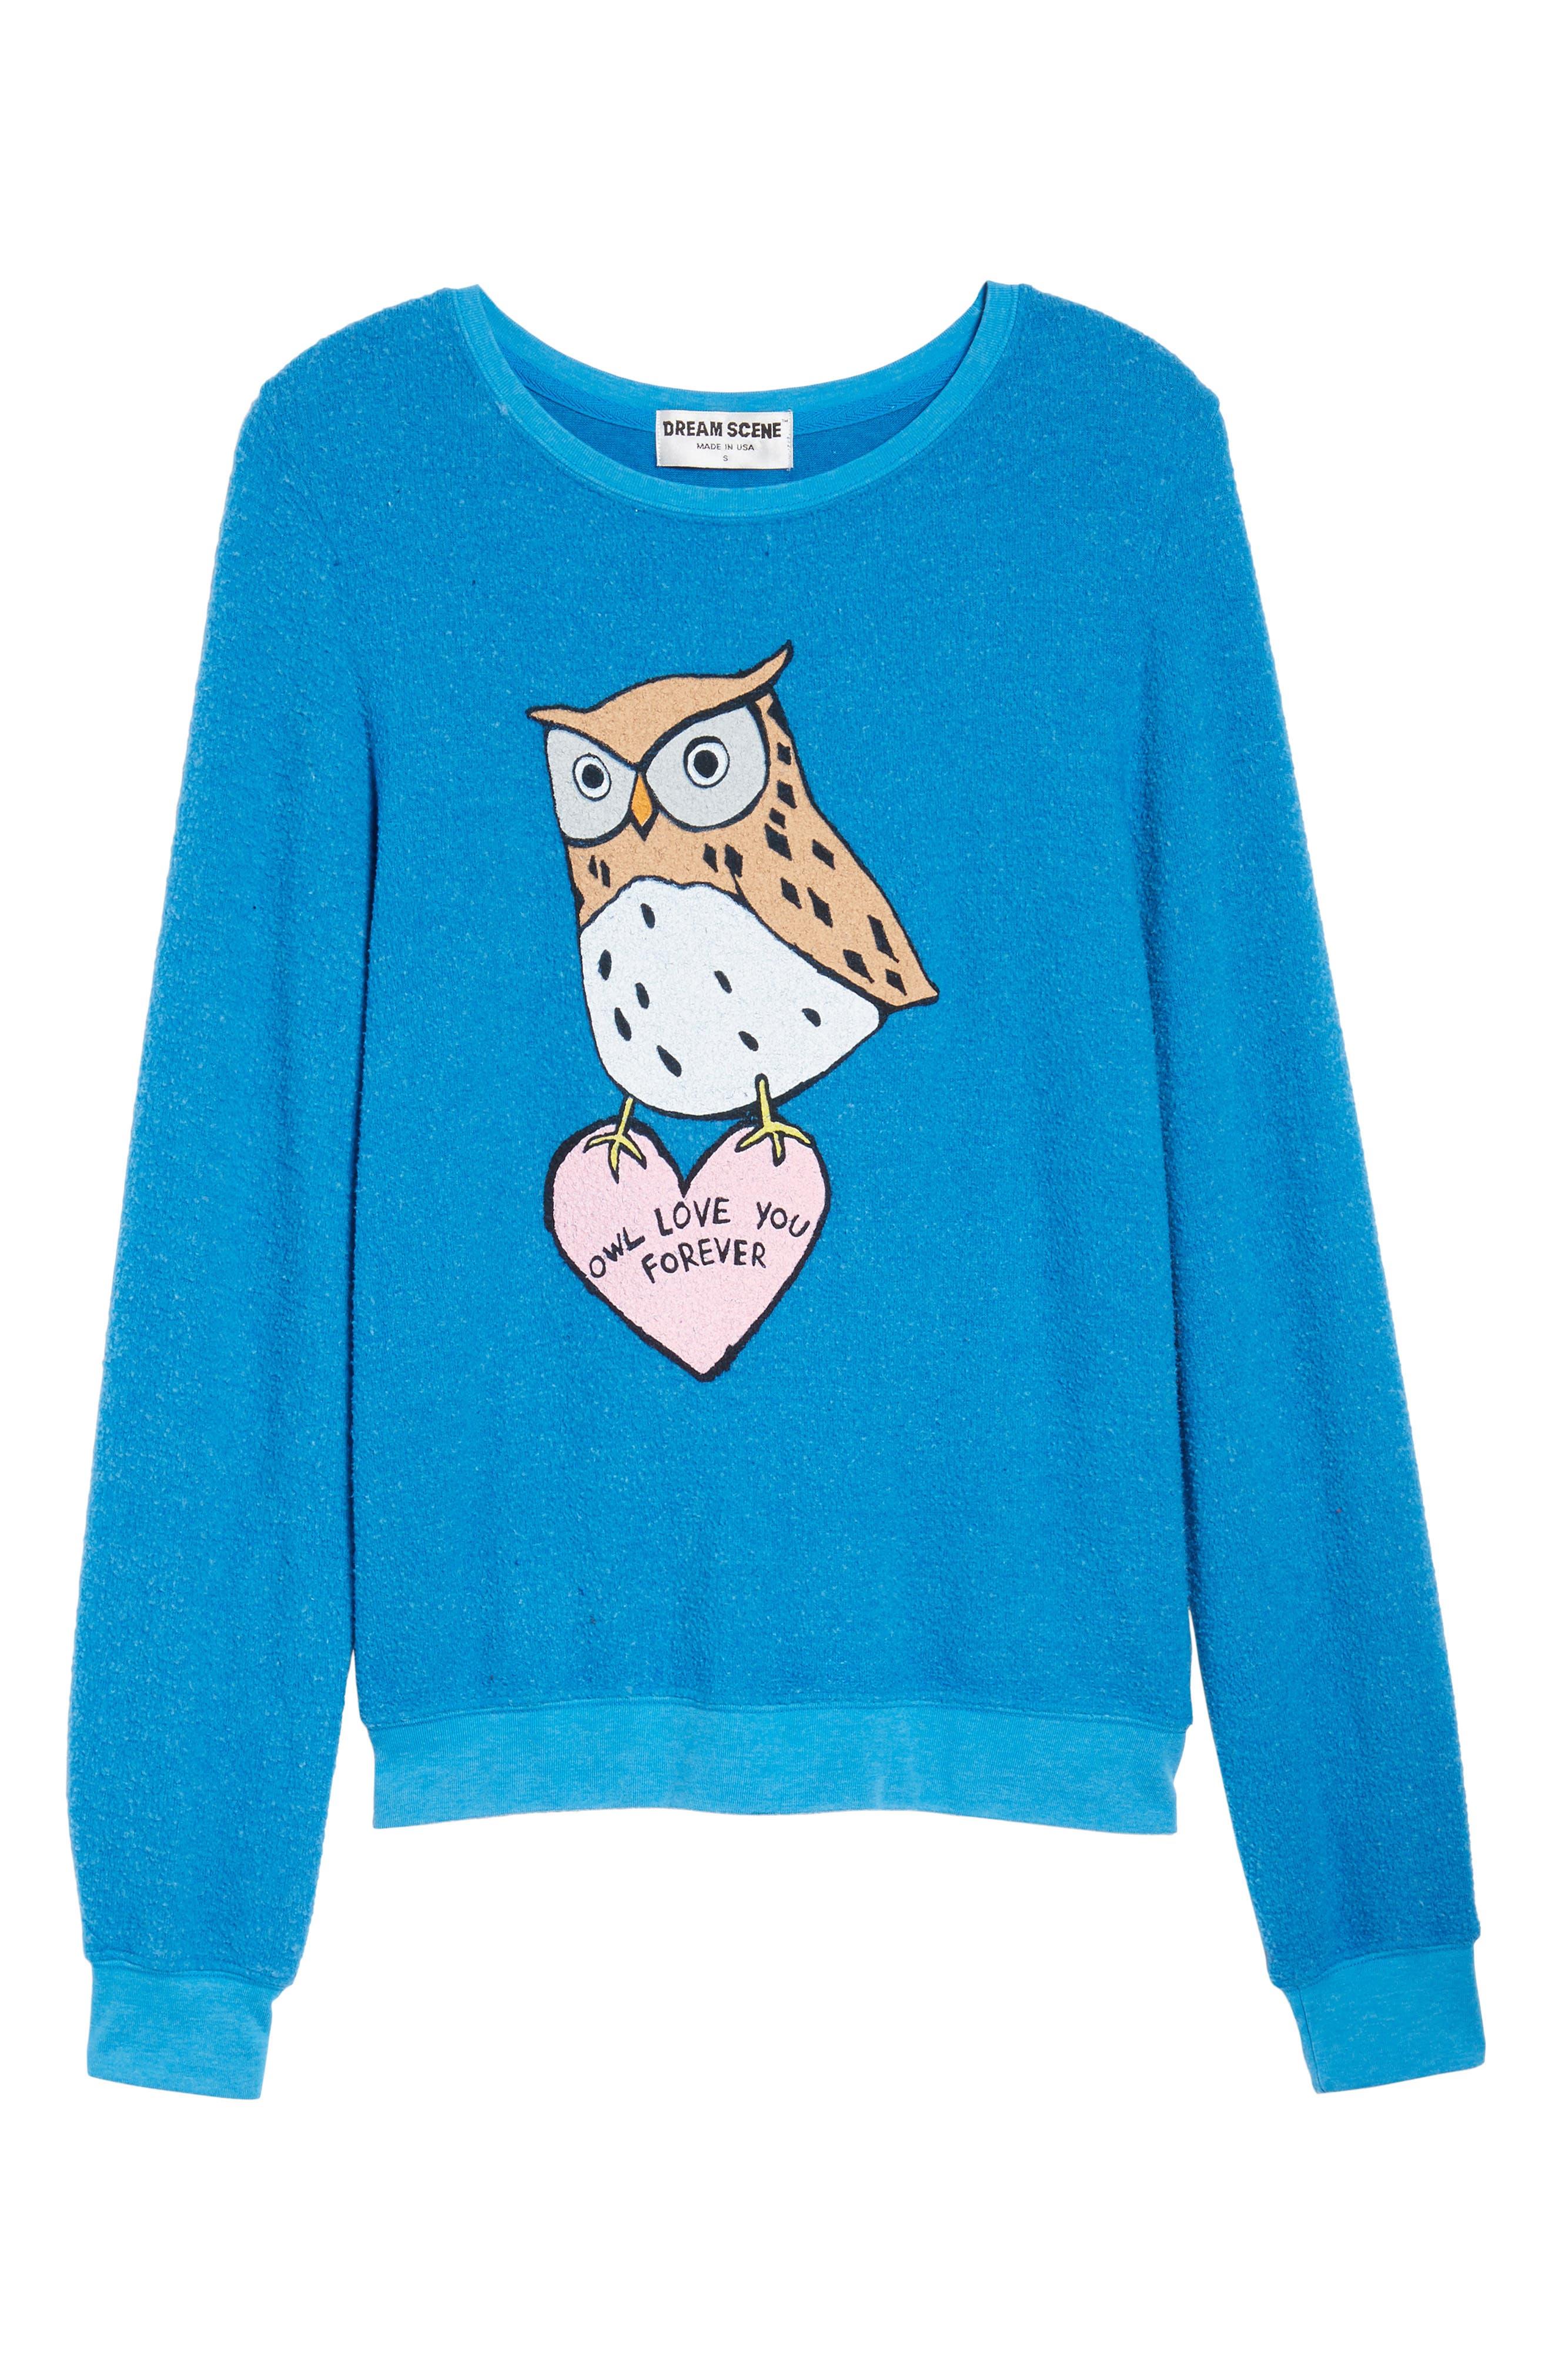 Owl Love You Forever Sweatshirt,                             Alternate thumbnail 6, color,                             Cobalt Sea